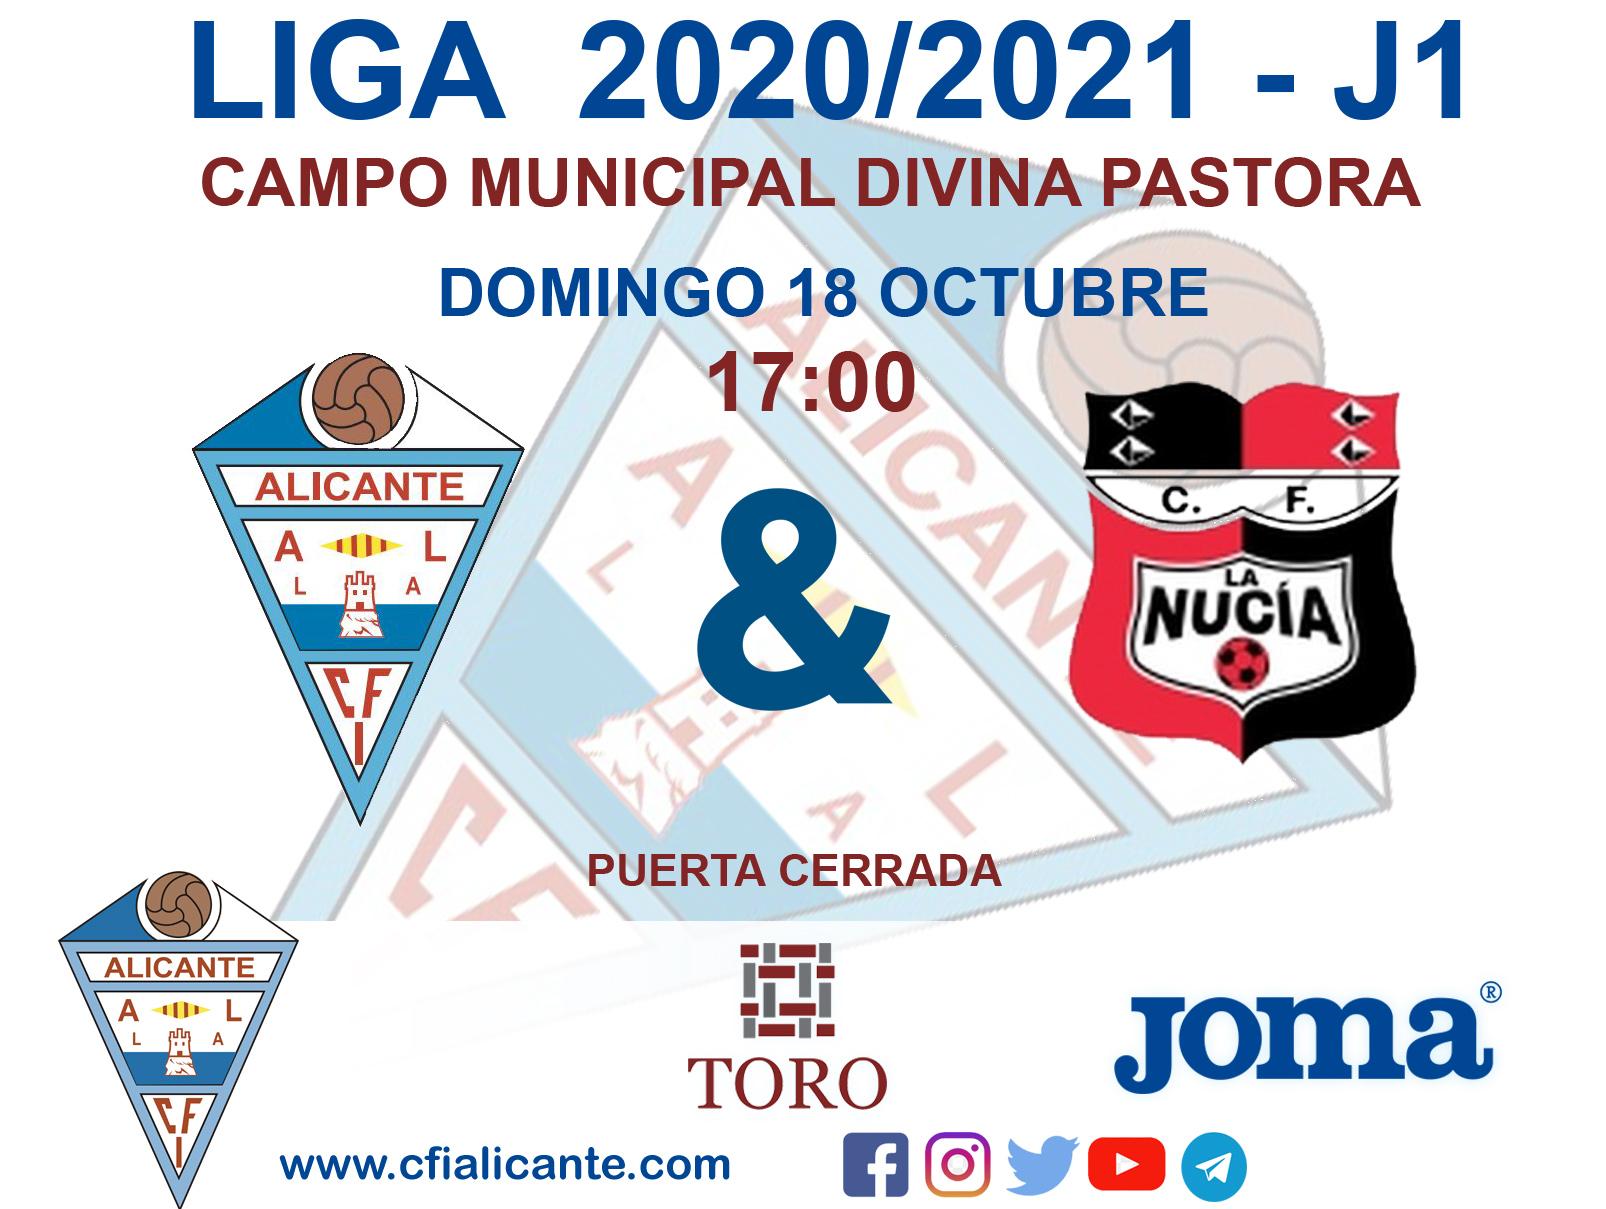 Primera jornada de liga, contra La Nucia B en el campo de Divina Pastora